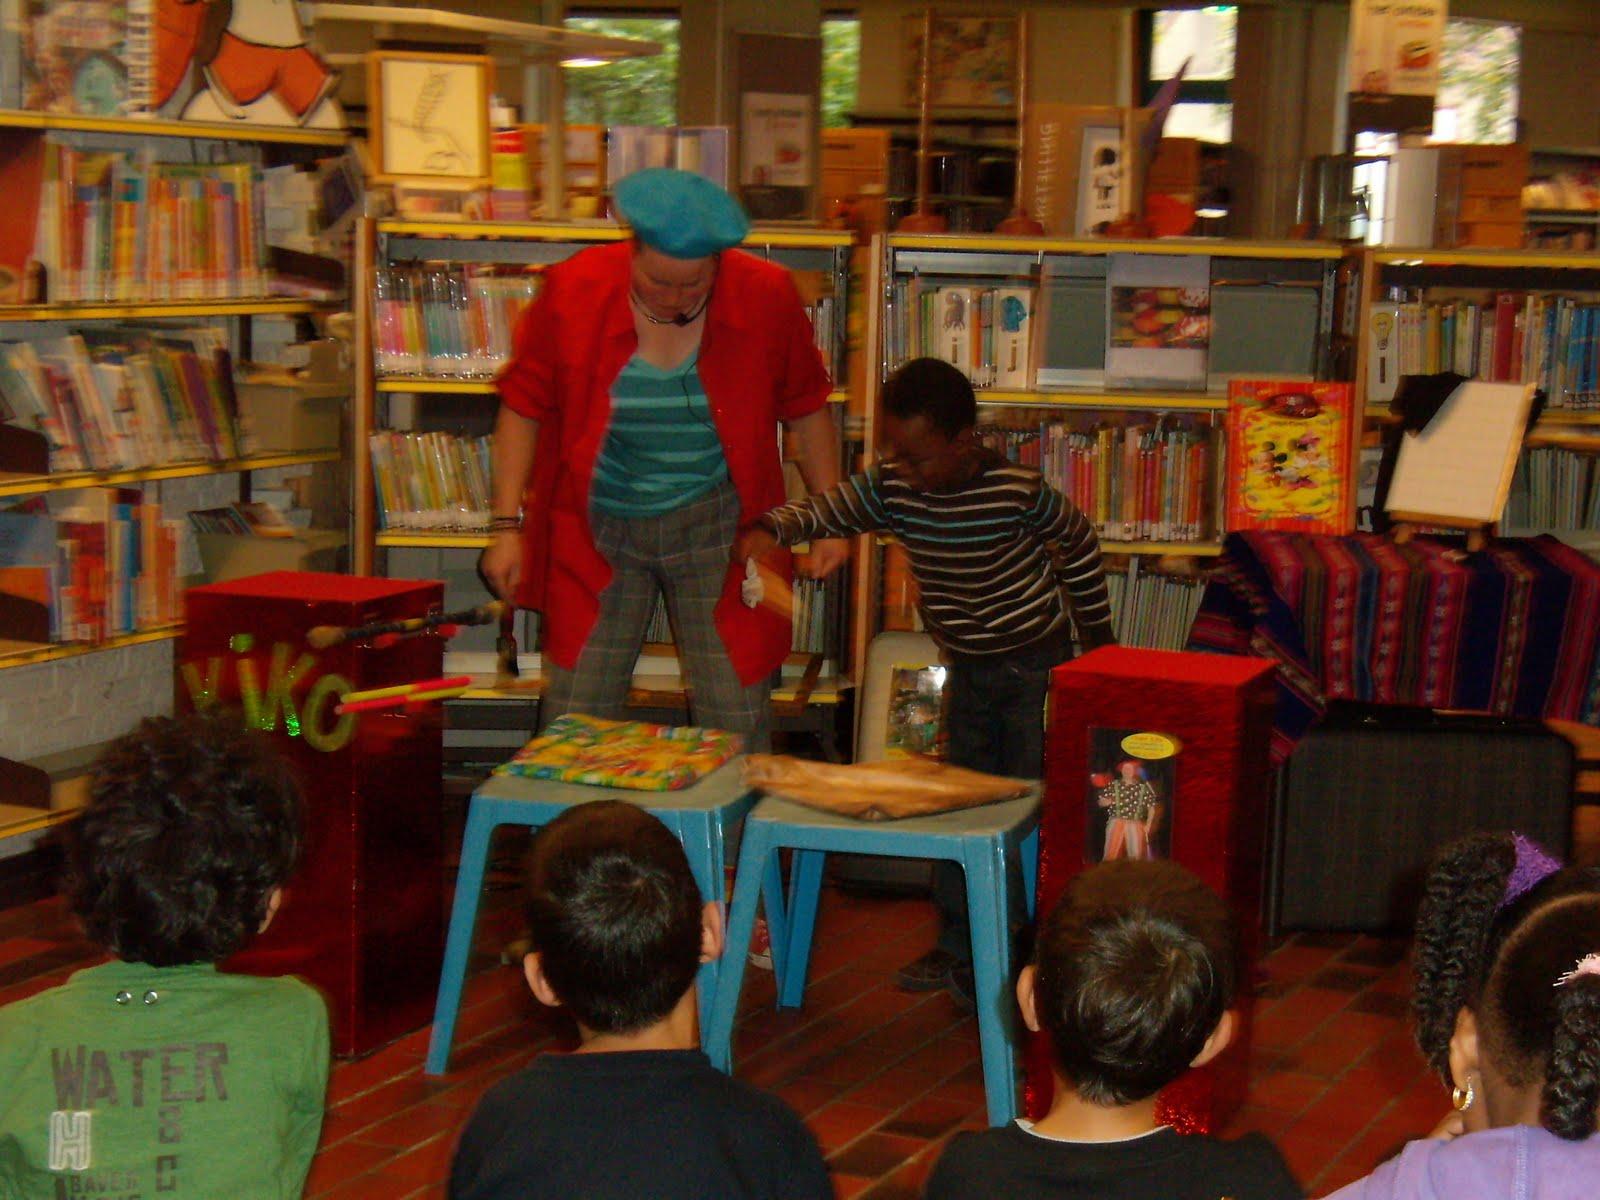 kindertheater kiko -kindervoorstelling Kikos tekenwedstrijd in de bibliotheek in Tilburg